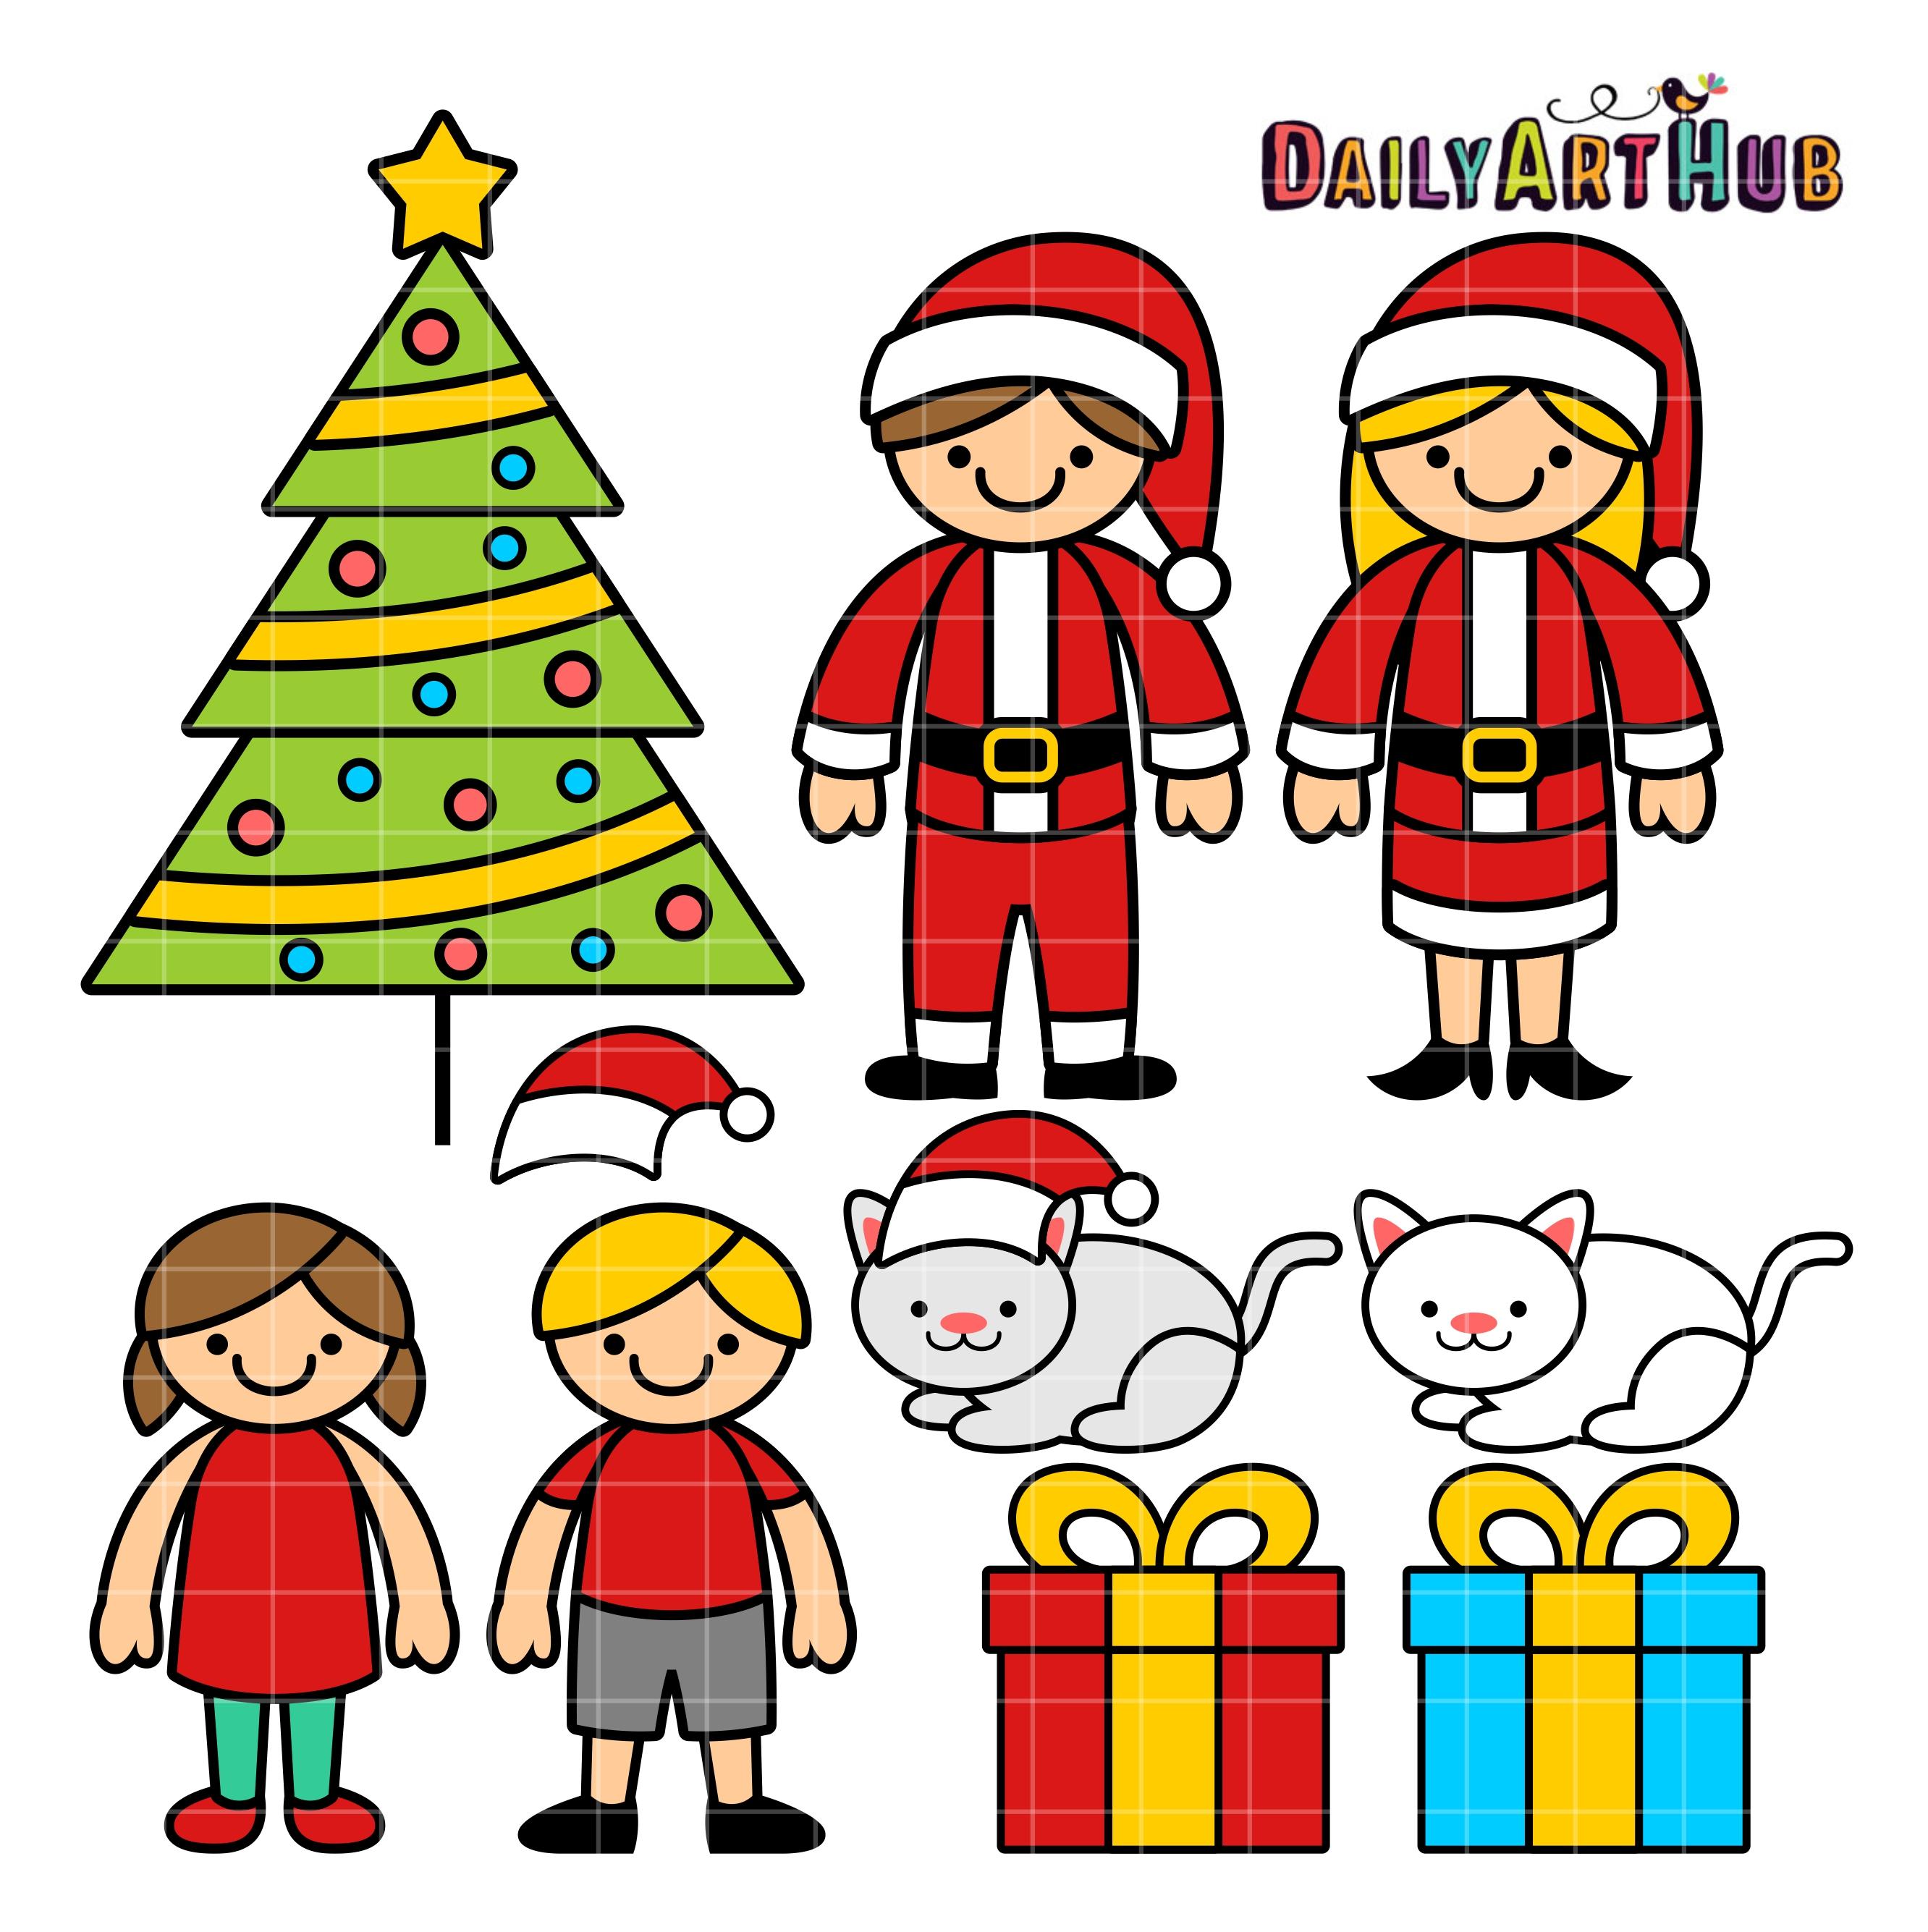 christmas family clip art set daily art hub free clip art everyday rh dailyarthub com